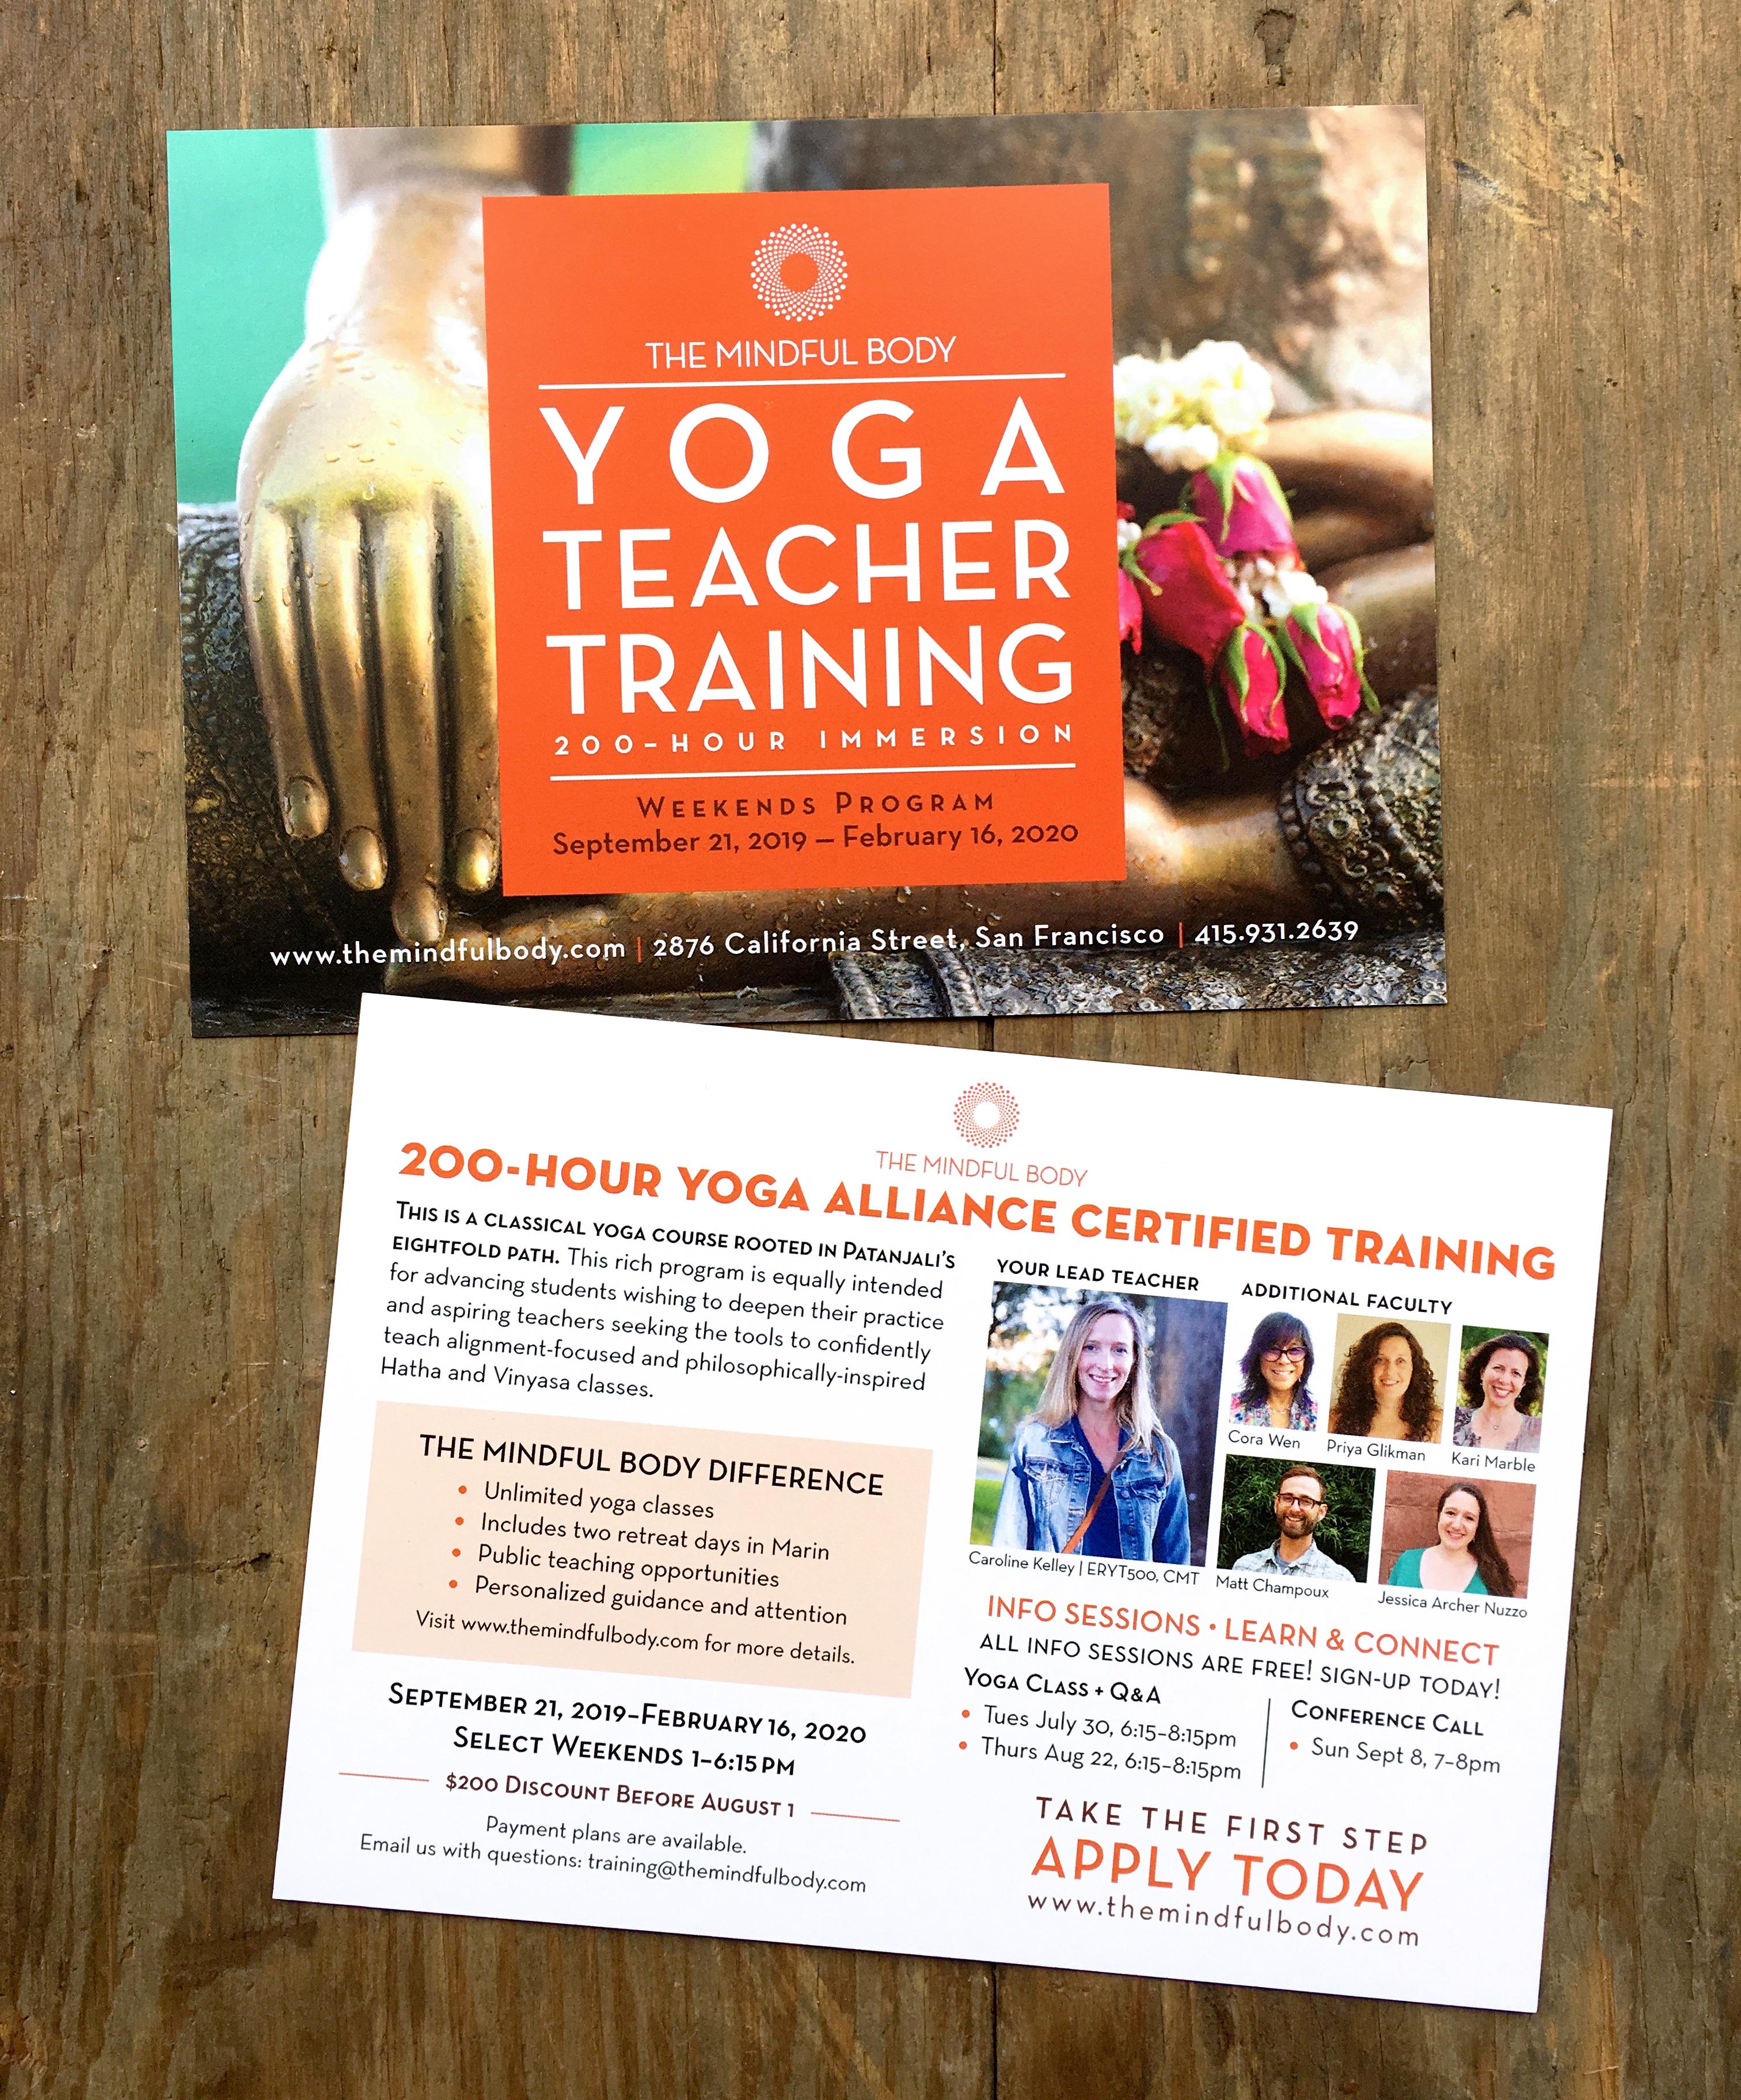 Yoga Teacher Training postcard